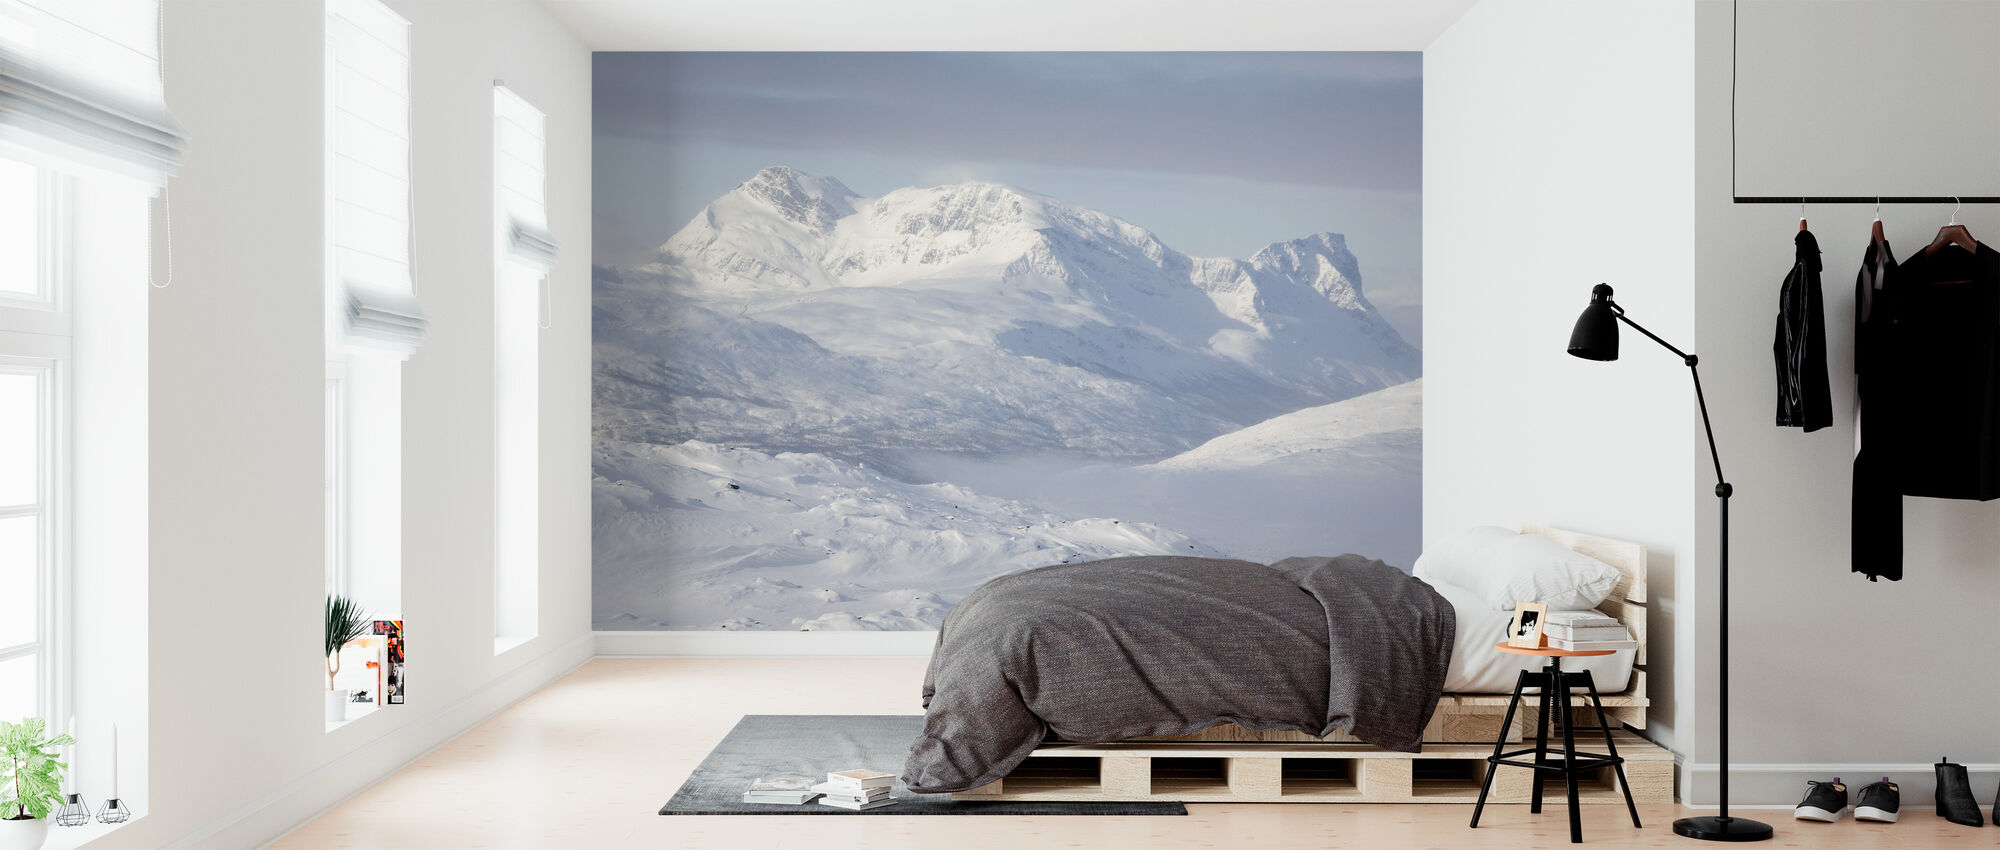 Snowy Mountains in Lapland, Sweden - Wallpaper - Bedroom